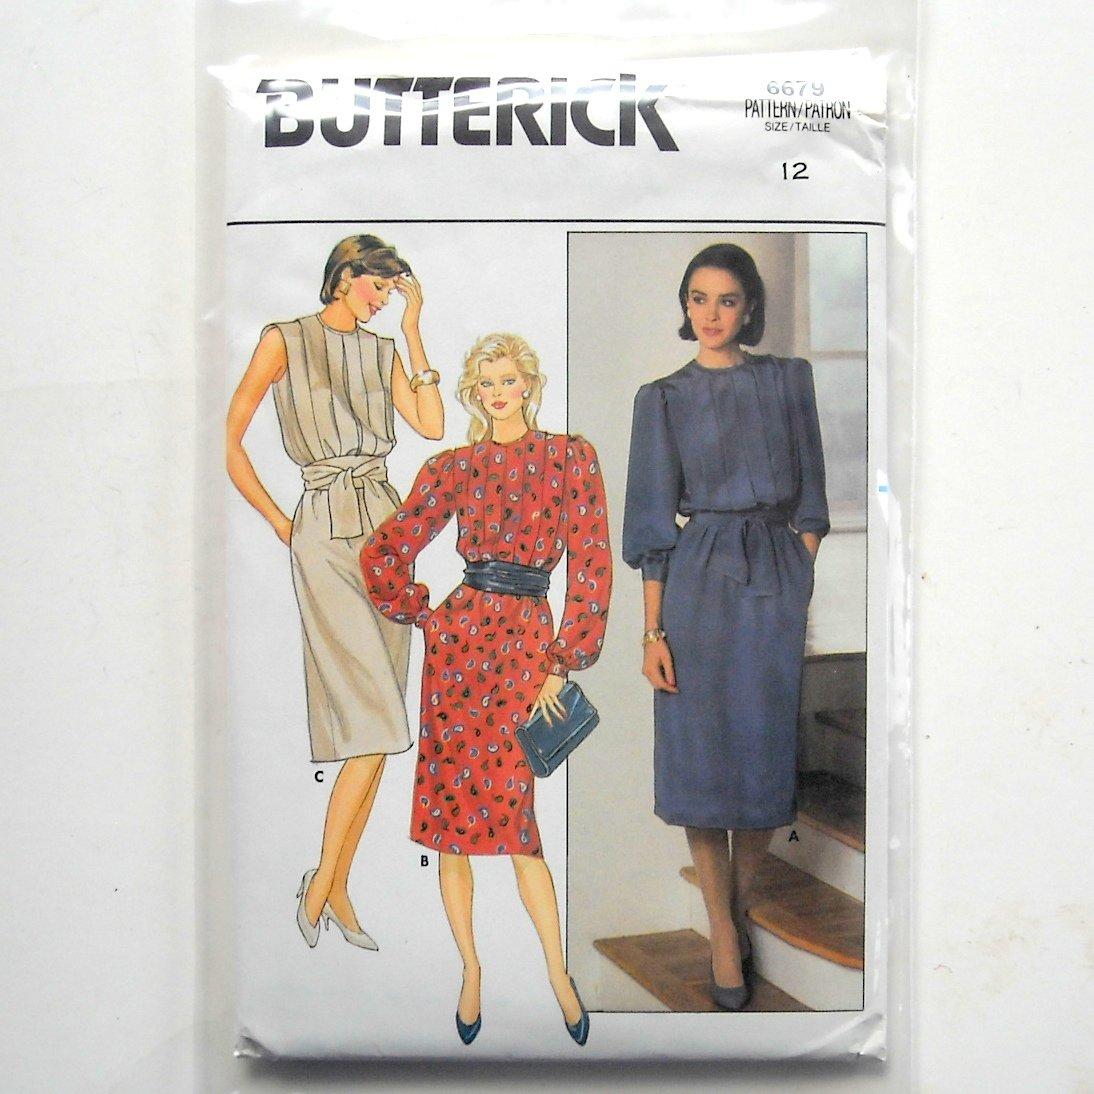 Dress Misses Size 12 Vintage Butterick Sewing Pattern 6679